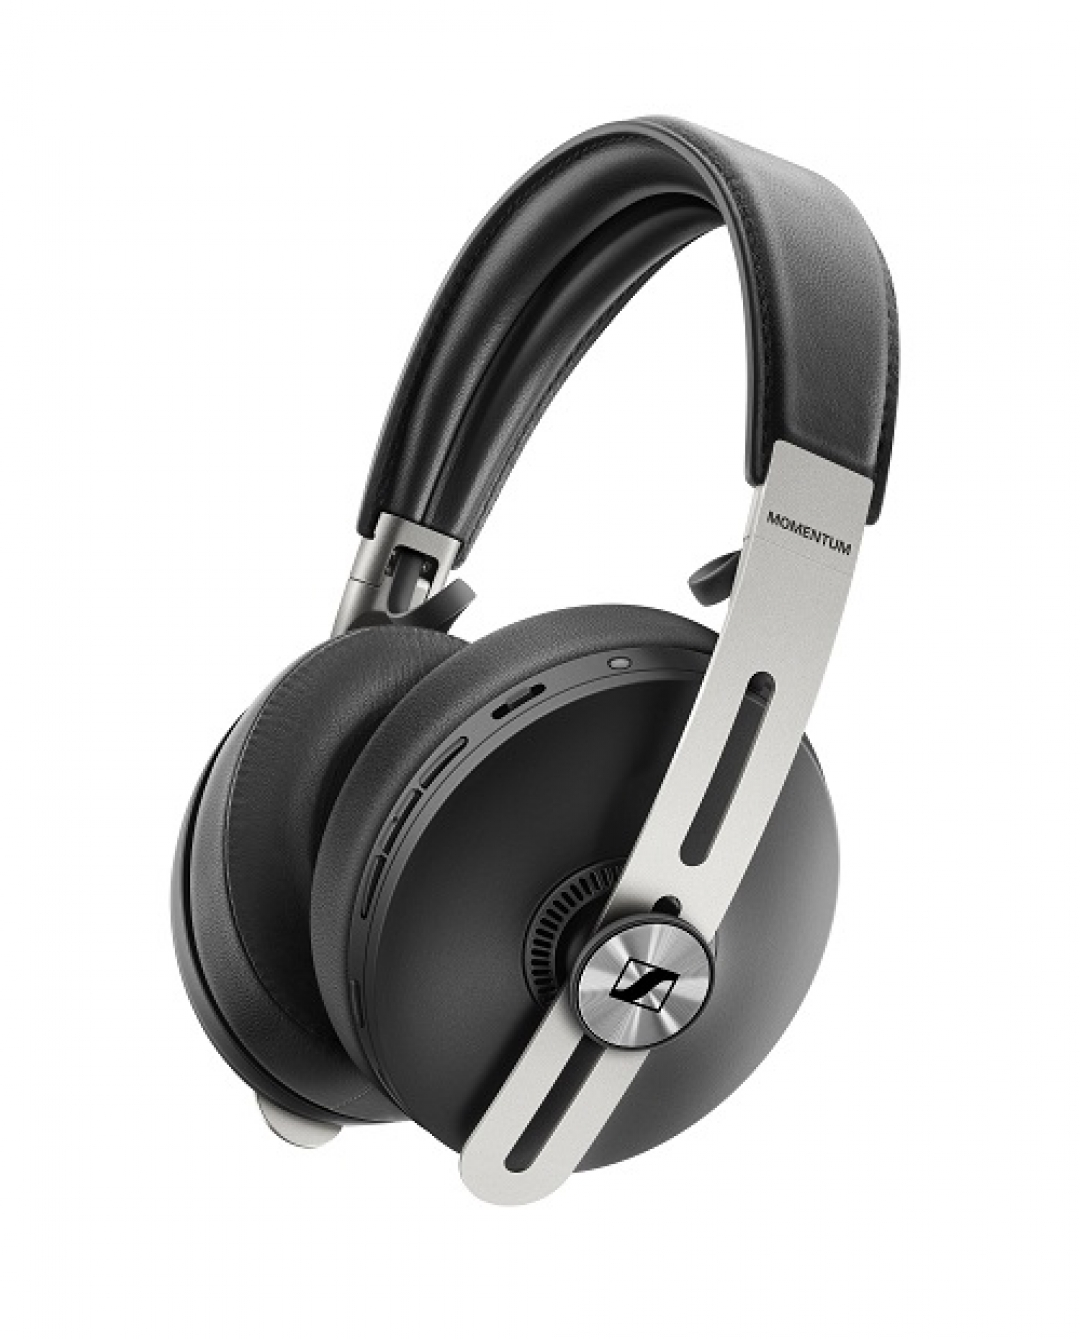 Tai nghe chống ồn Sennheiser Momentum 3 Wireless